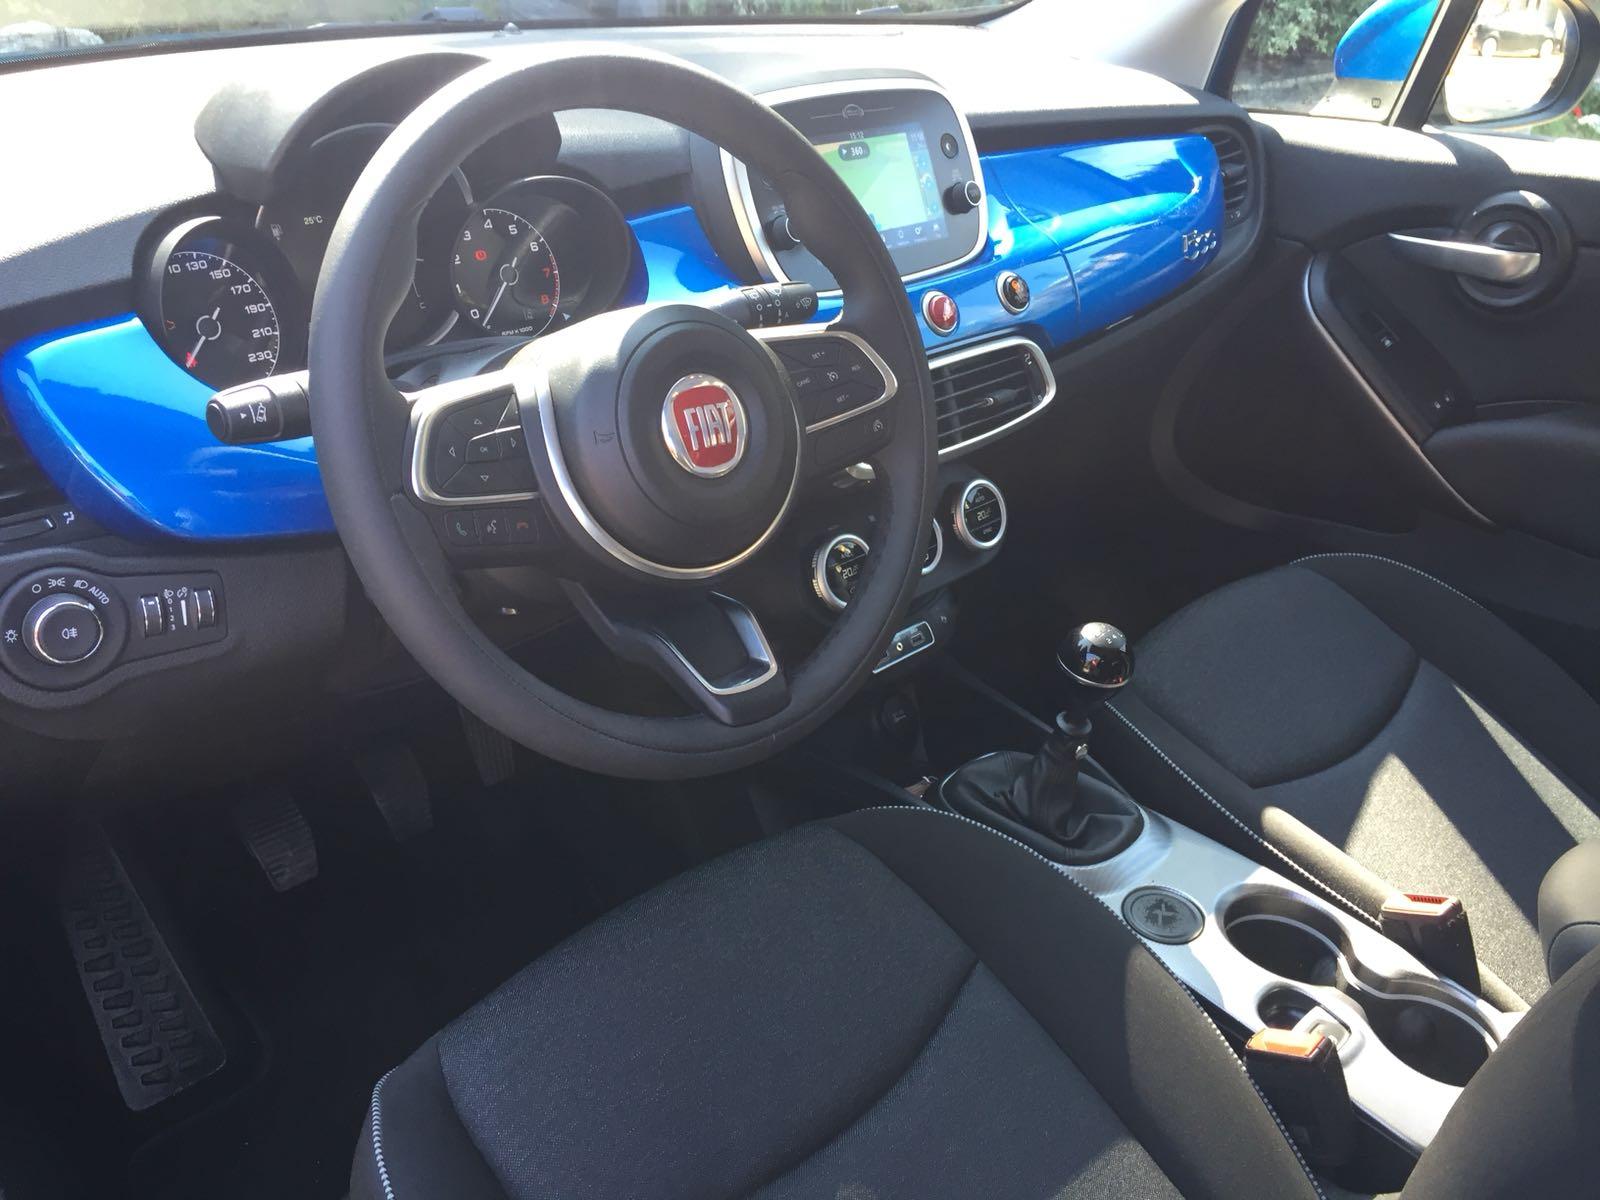 fiat-500x-interi-sedili-anteriori-volante